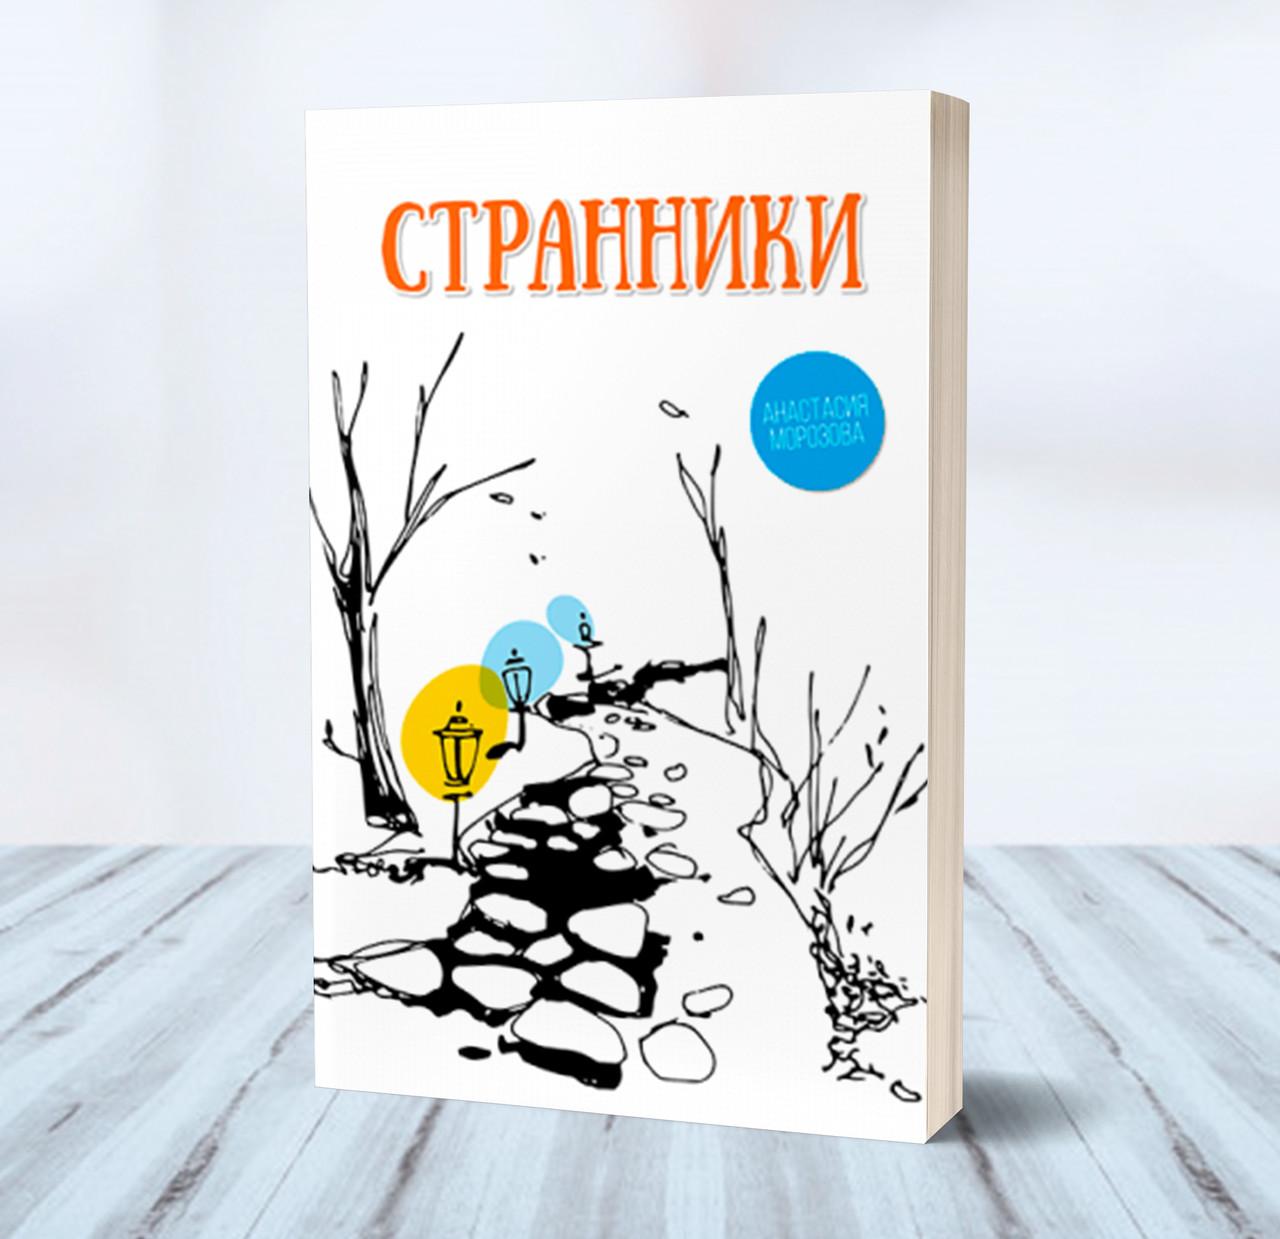 """Странники"" Анастасия Морозова"